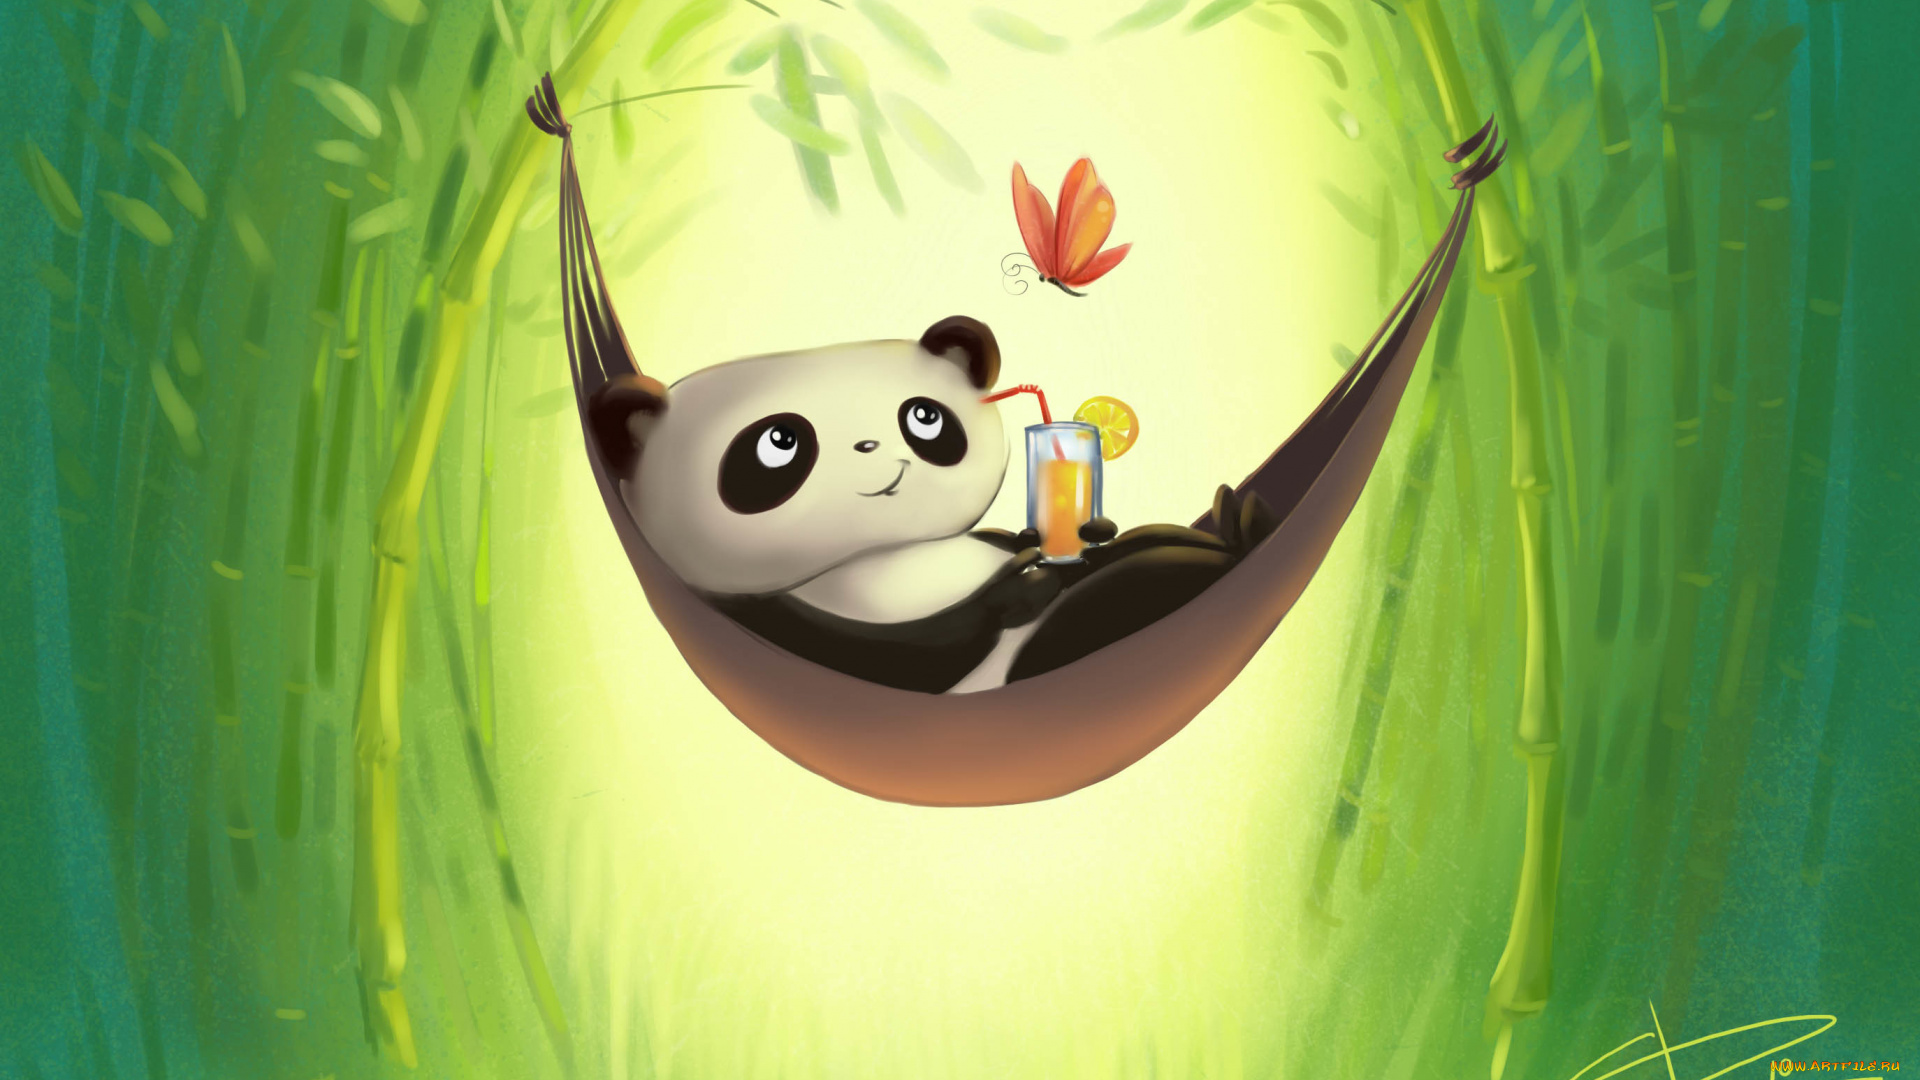 Монако, прикольная панда рисунок